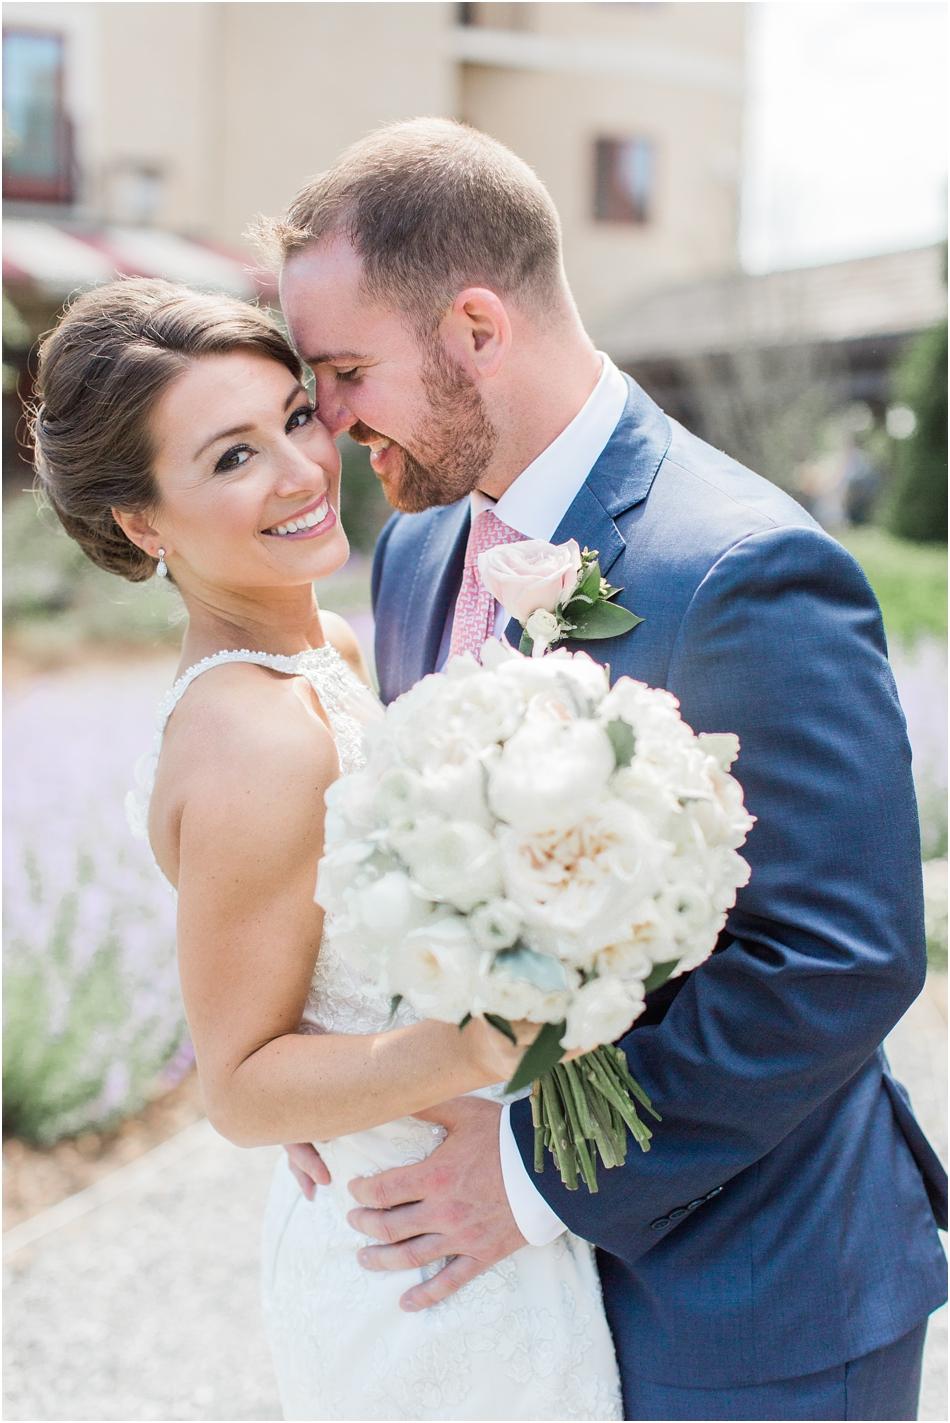 pine_hills_mirbeau_golf_club_boston_massachusetts_cape_cod_new_england_wedding_photographer_Meredith_Jane_Photography_photo_1692.jpg